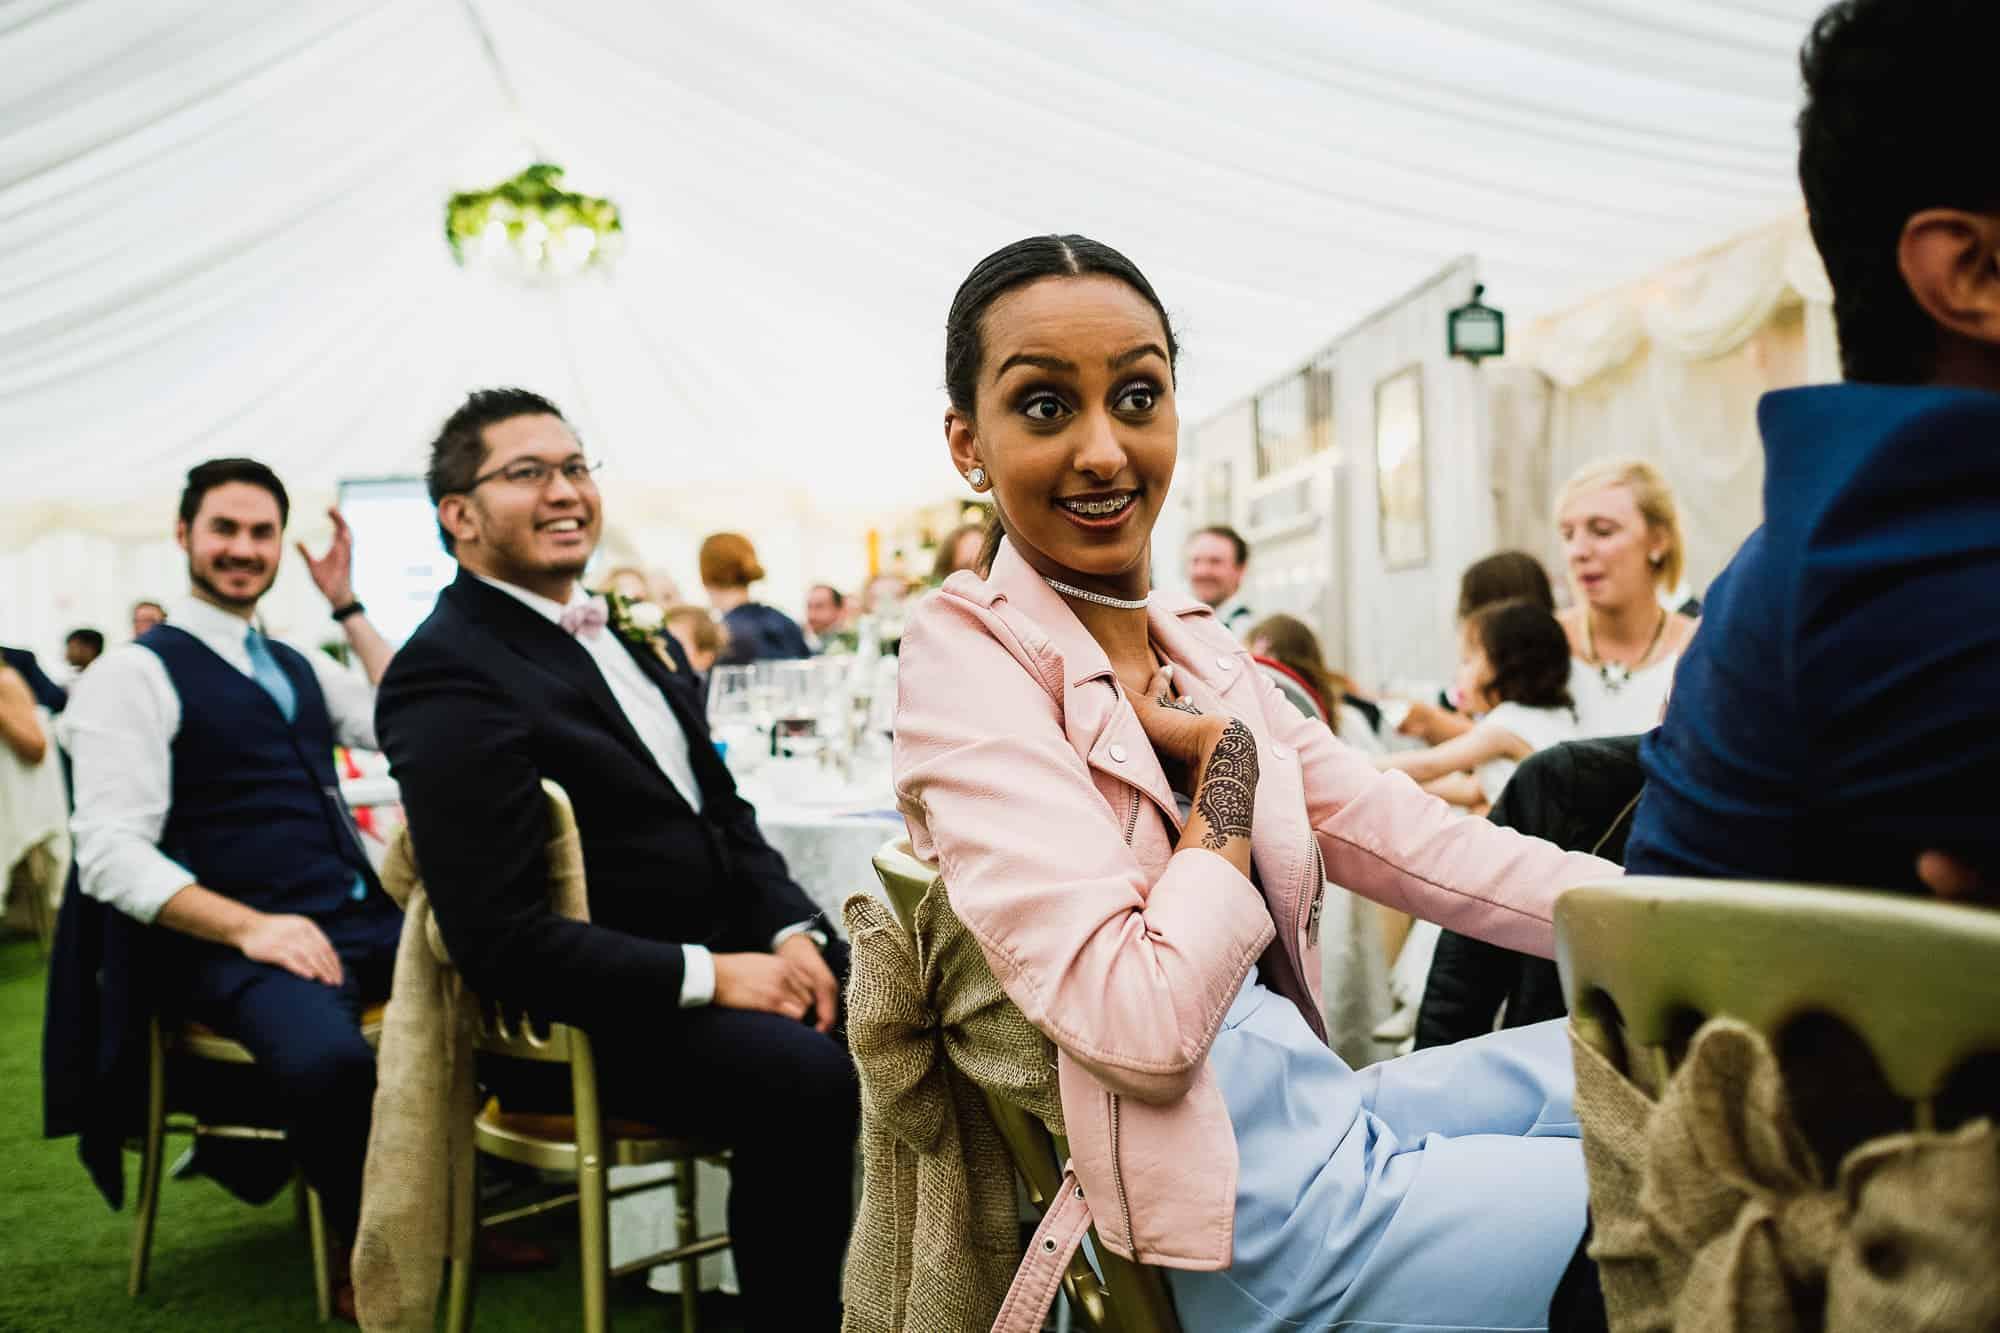 marleybrook-house-wedding-photography-matt-tyler-0055